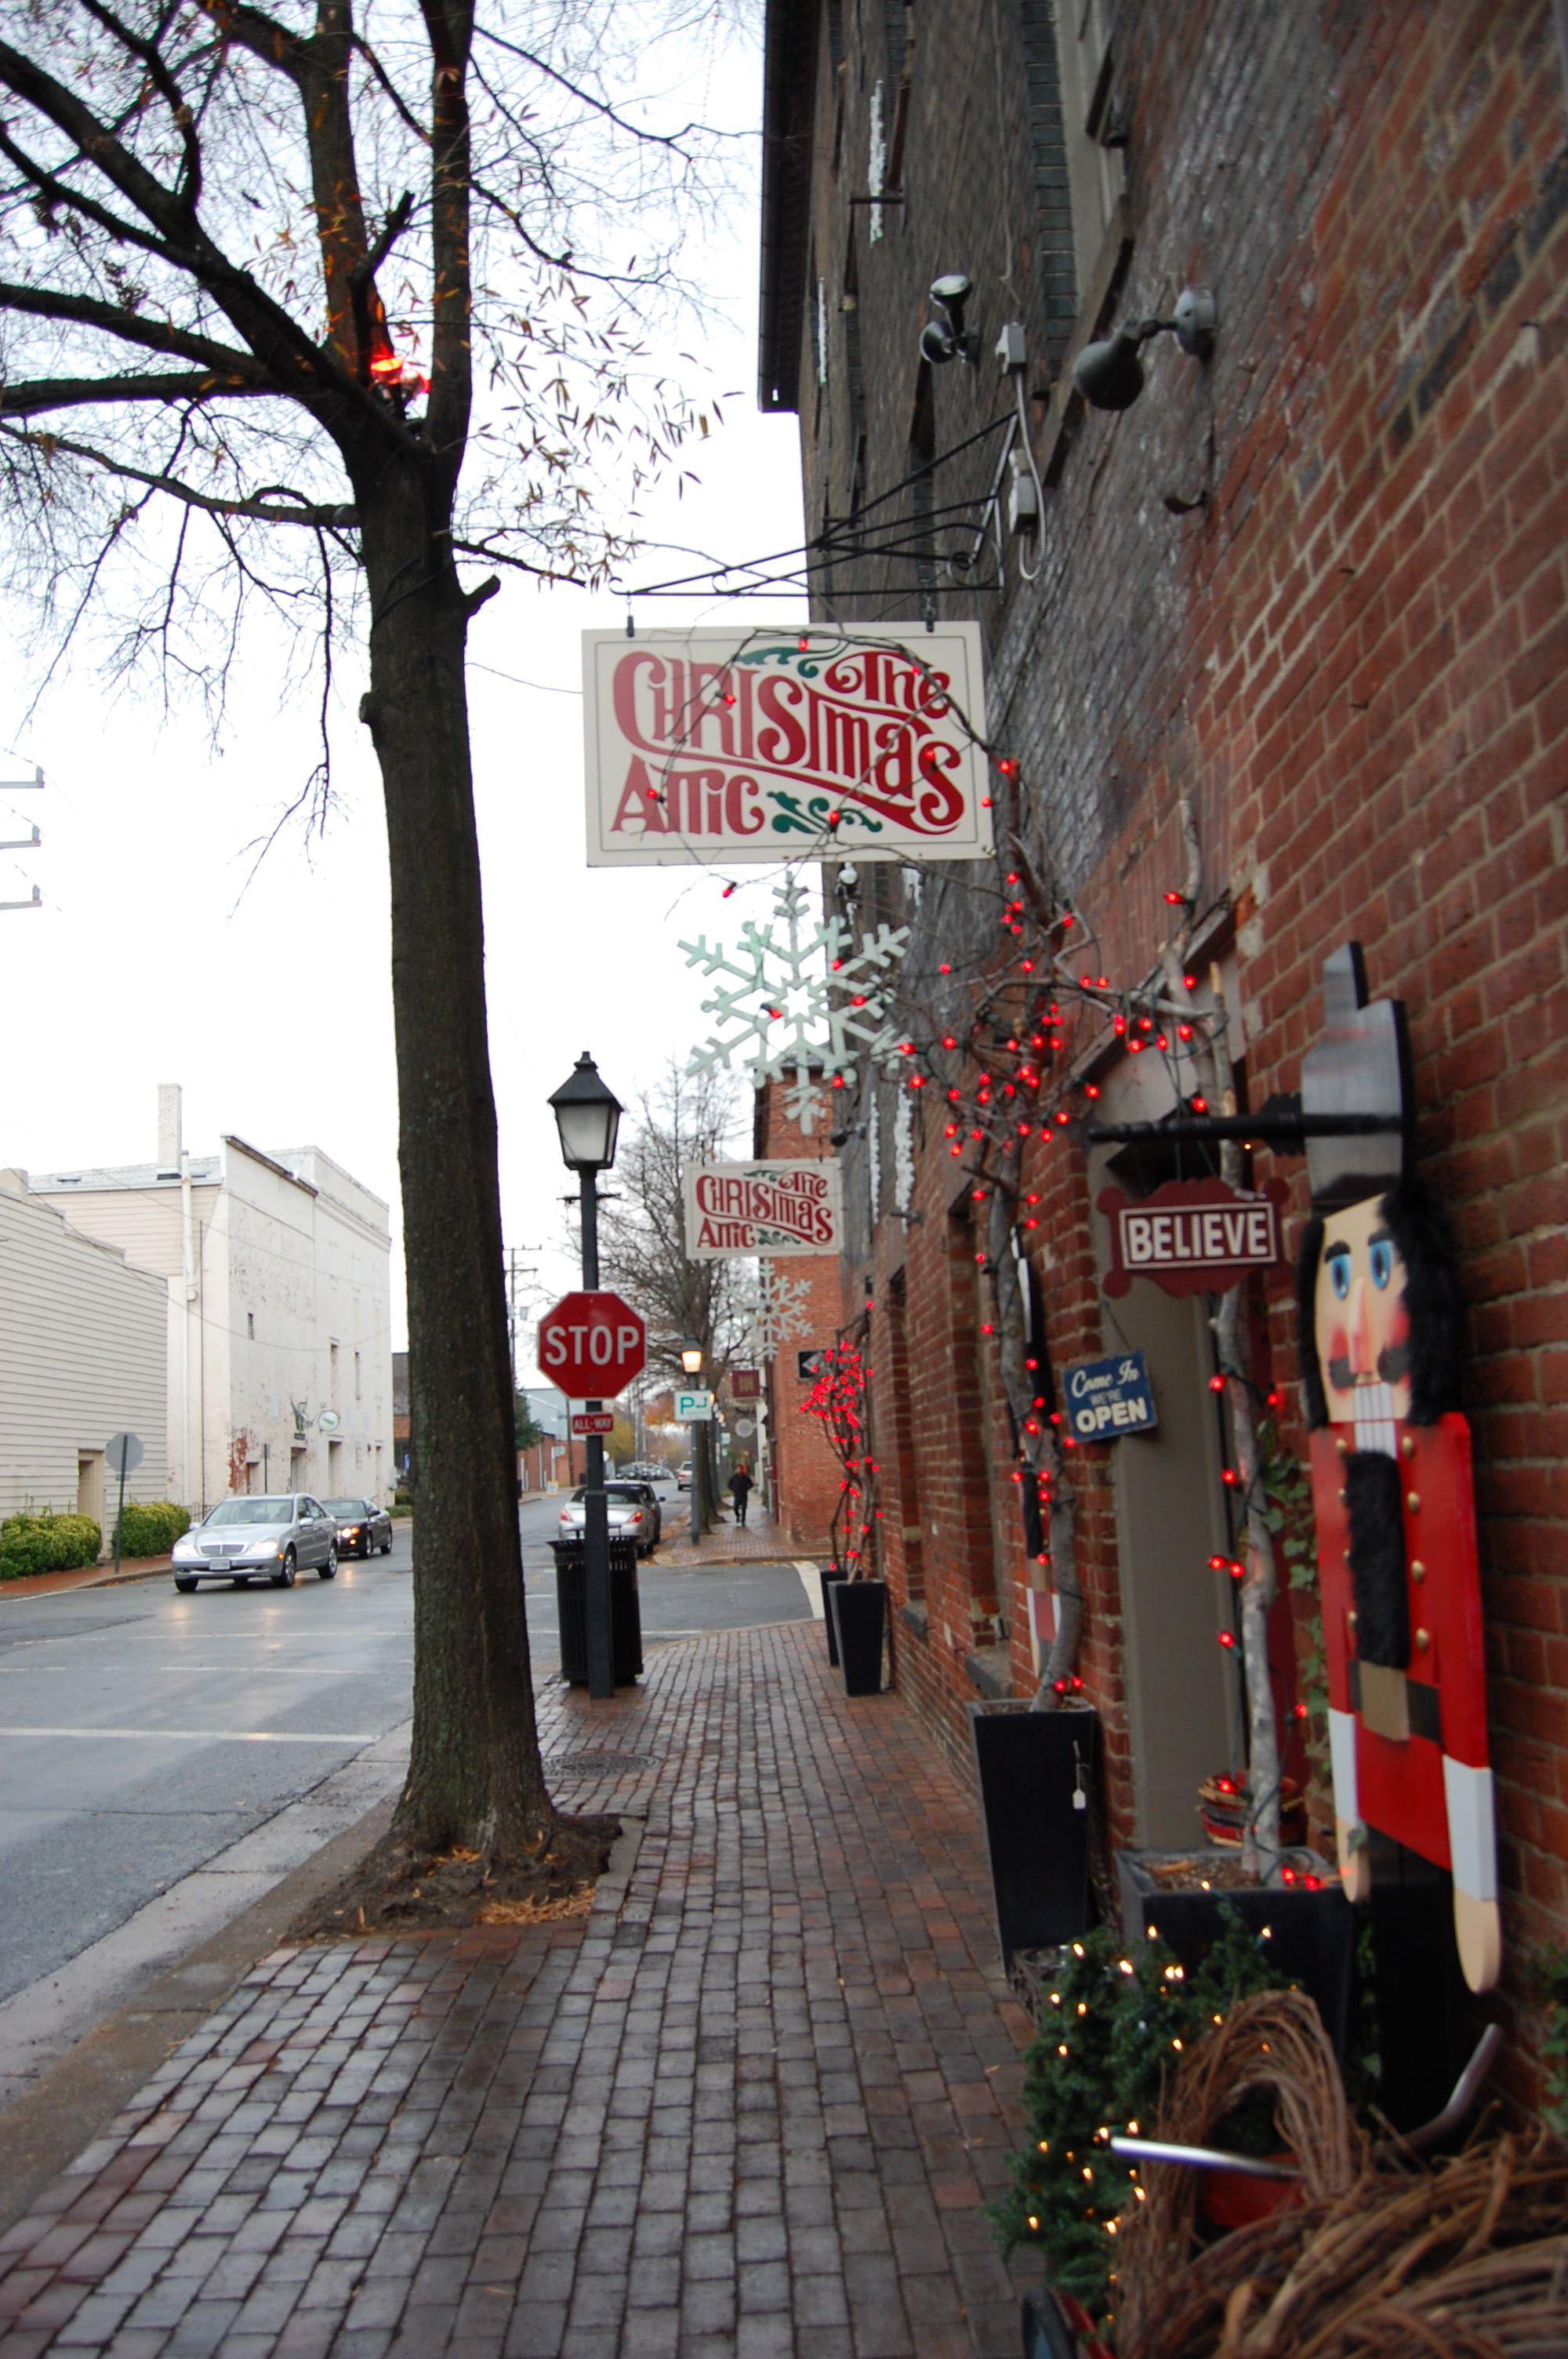 The Christmas Attic 125 S. Union St. Alexandria, VA 22314